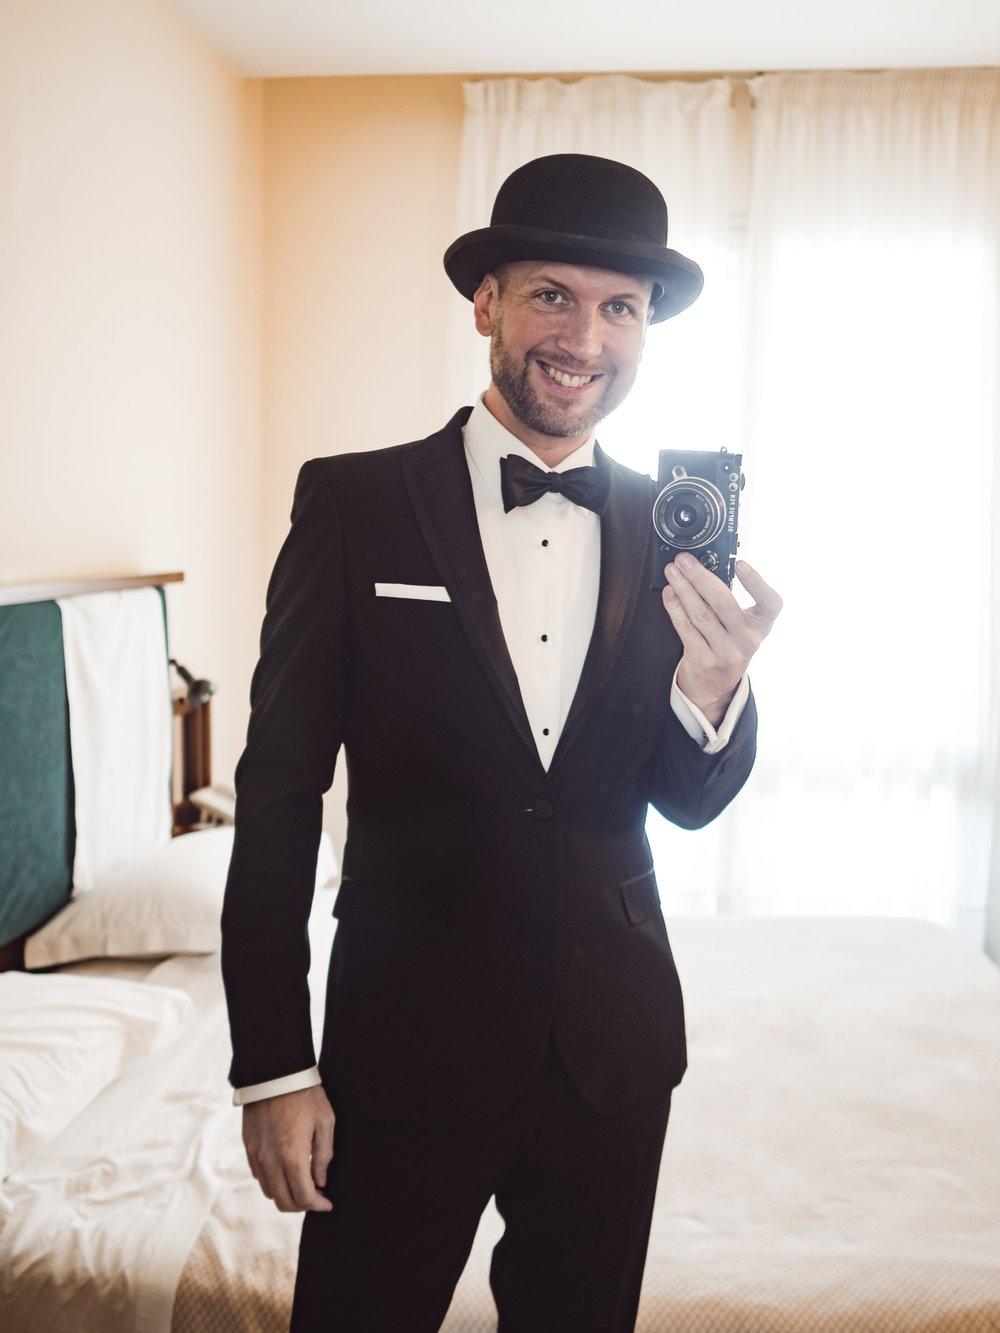 Jay McLaughlin Hernia Surgery Inguinal Black Tie Bowtie Bowler Hat Tuxedo Olympus PEN-F Italy Ravello Amalfi